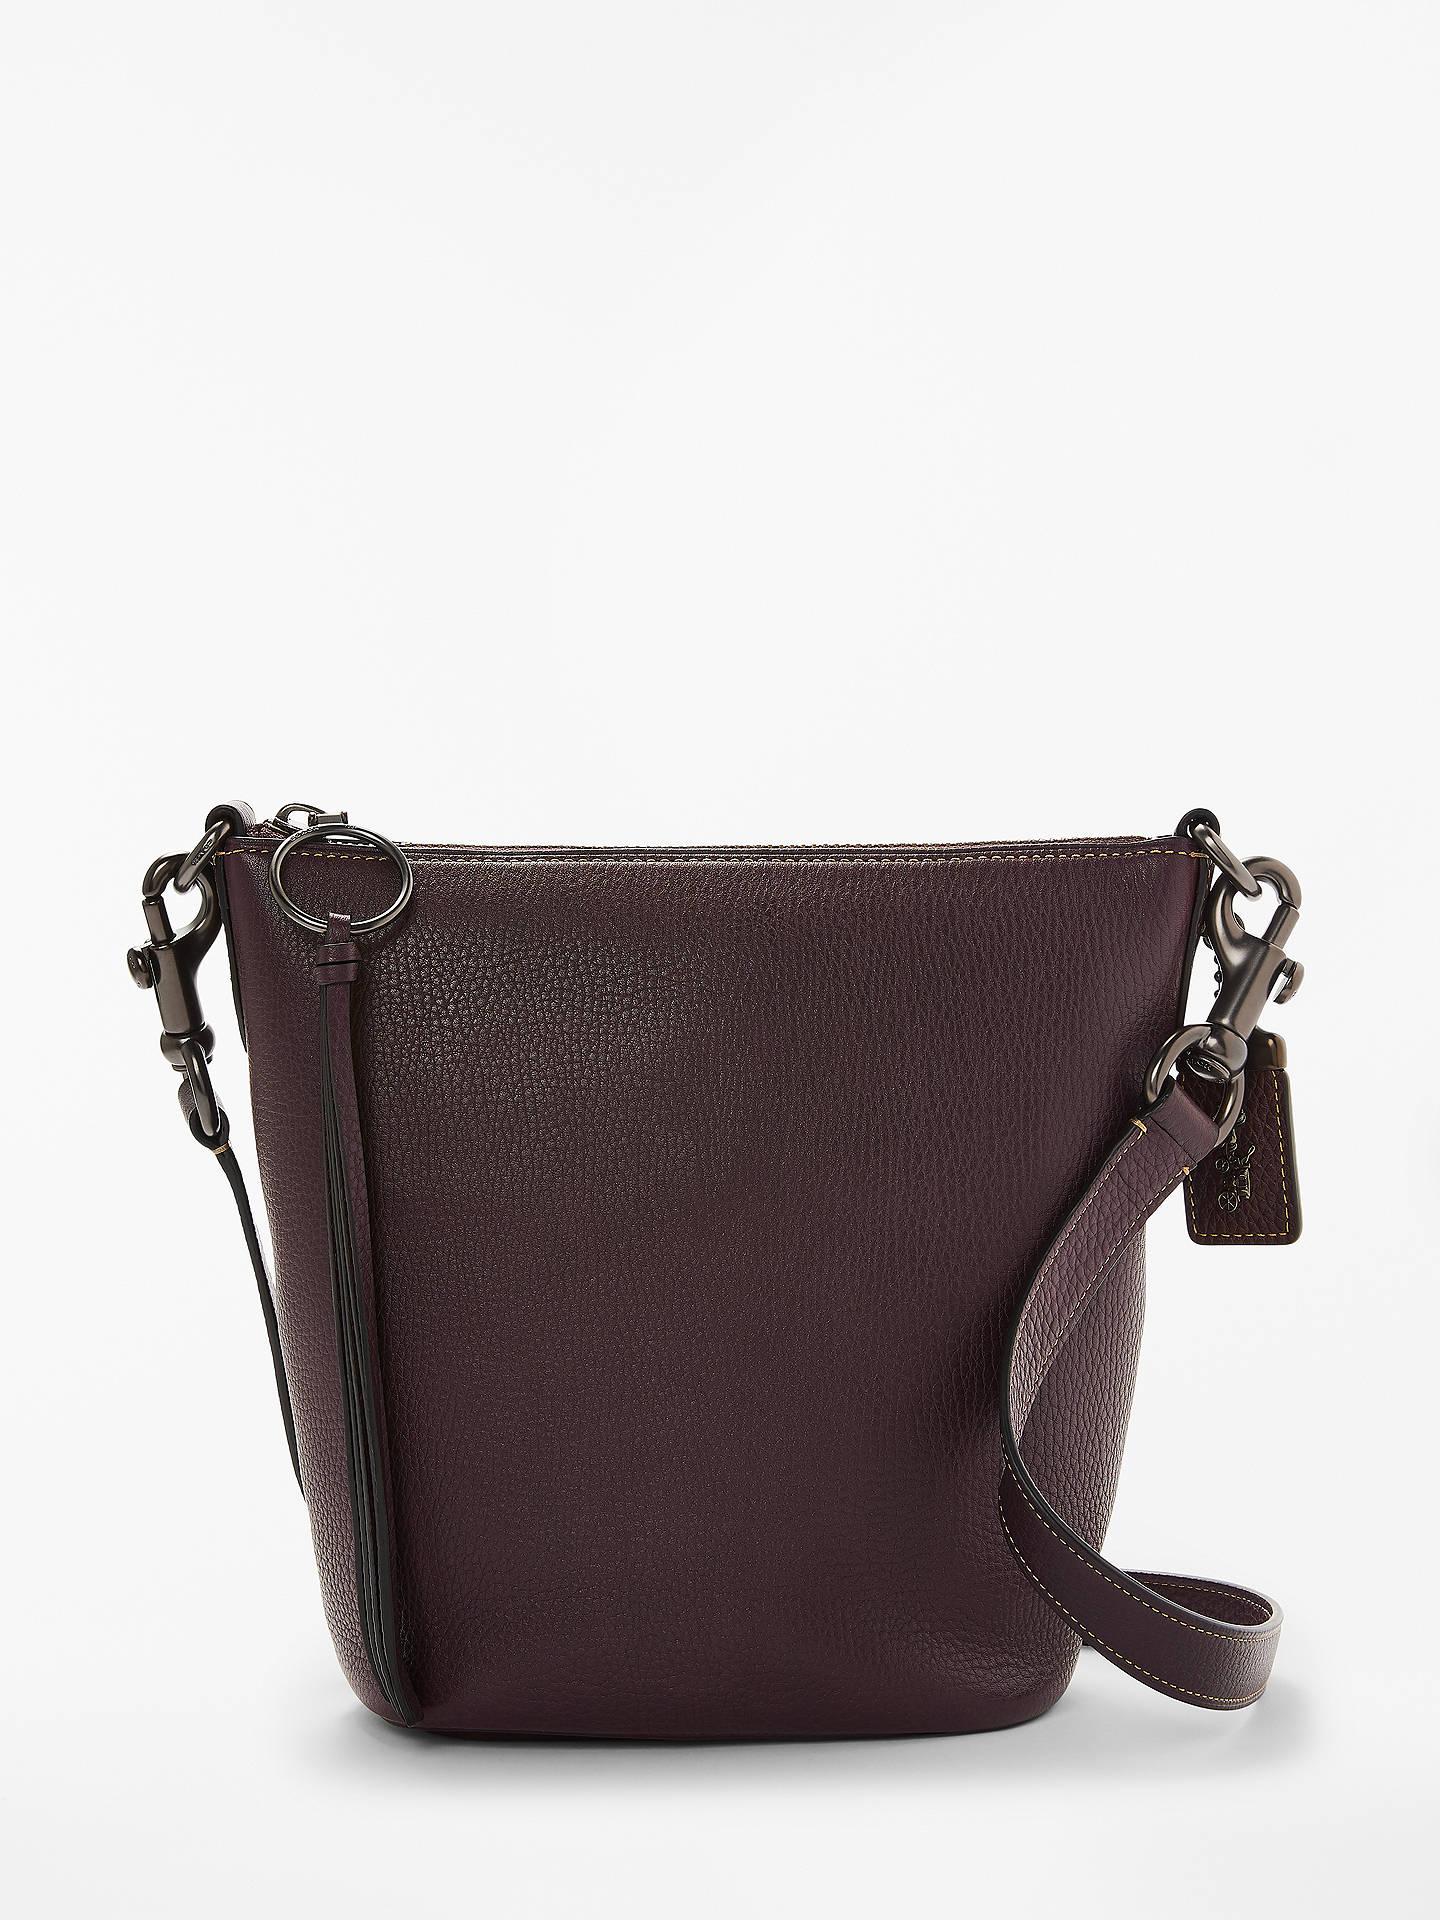 41dcedff6d Buy Coach Duffle 20 Leather Cross Body Bag